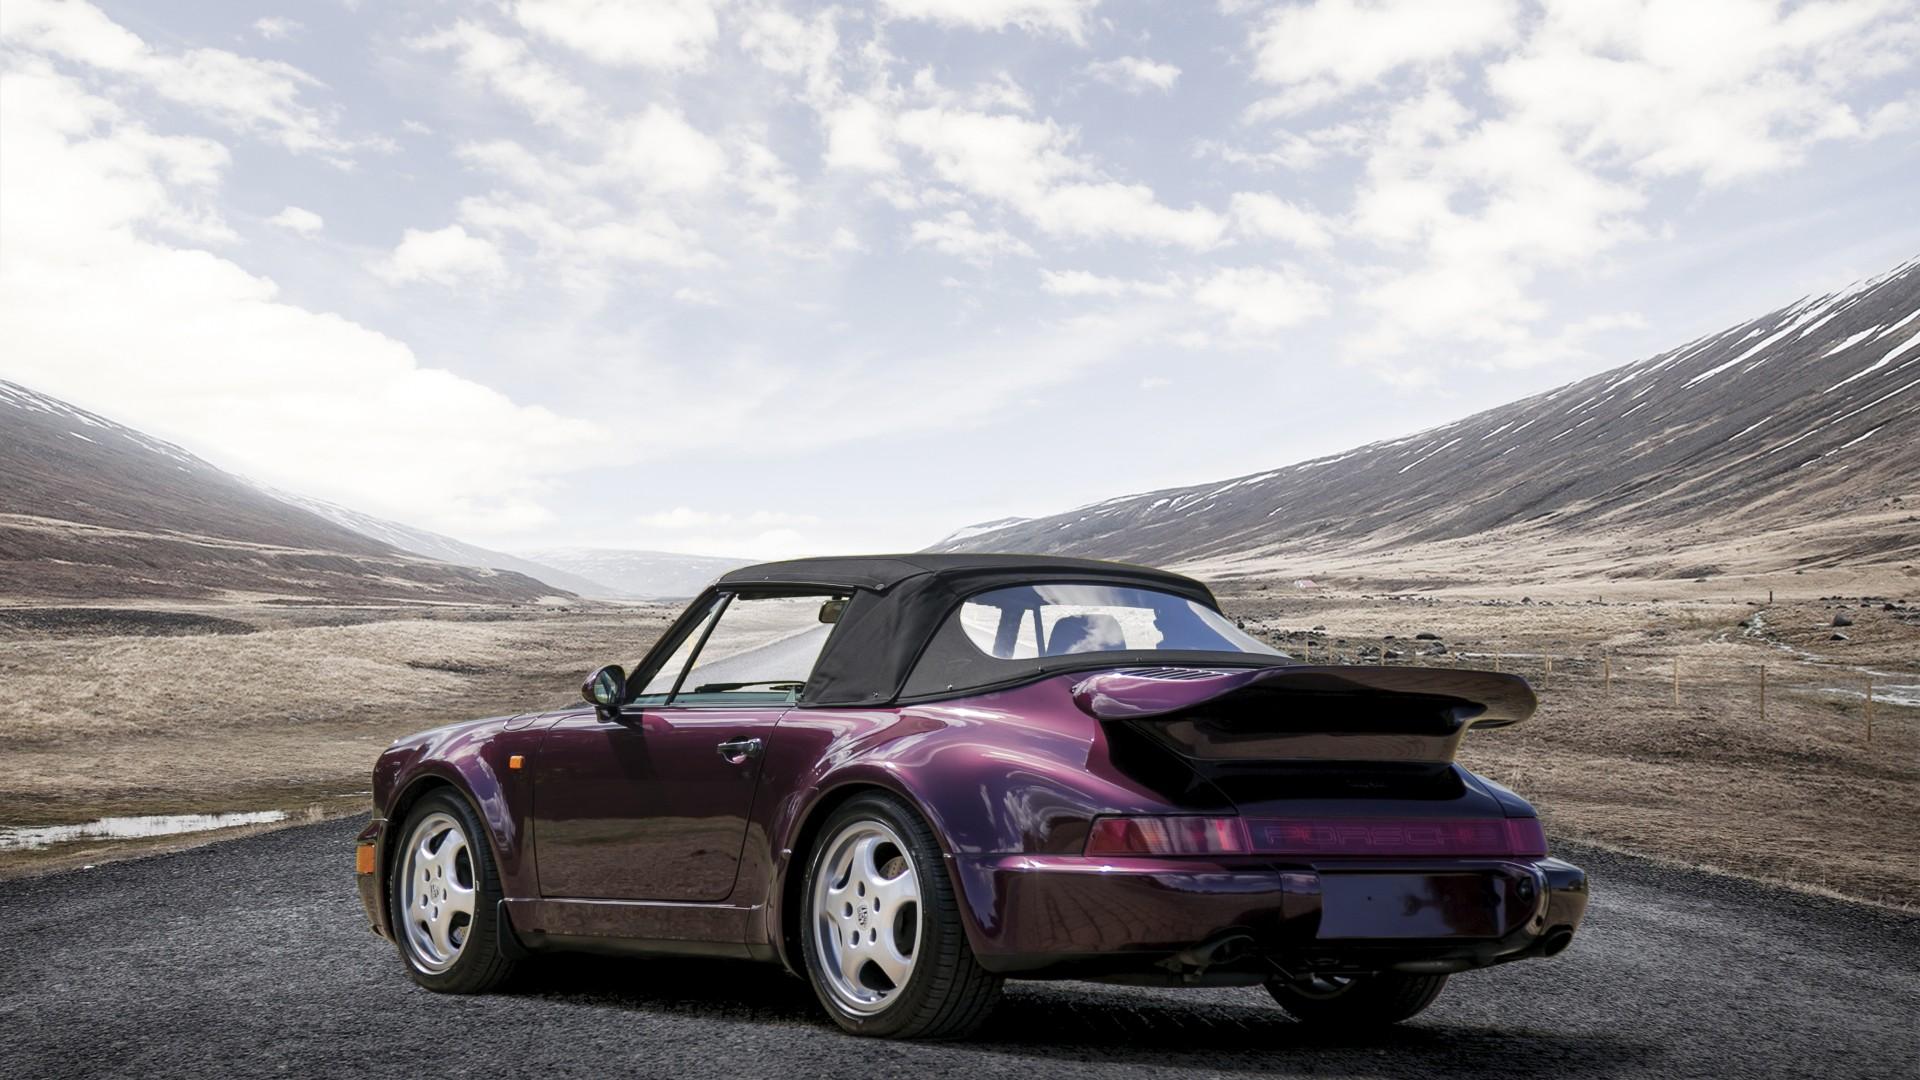 1993 Porsche 911 (964) Turbo (1989-1994)